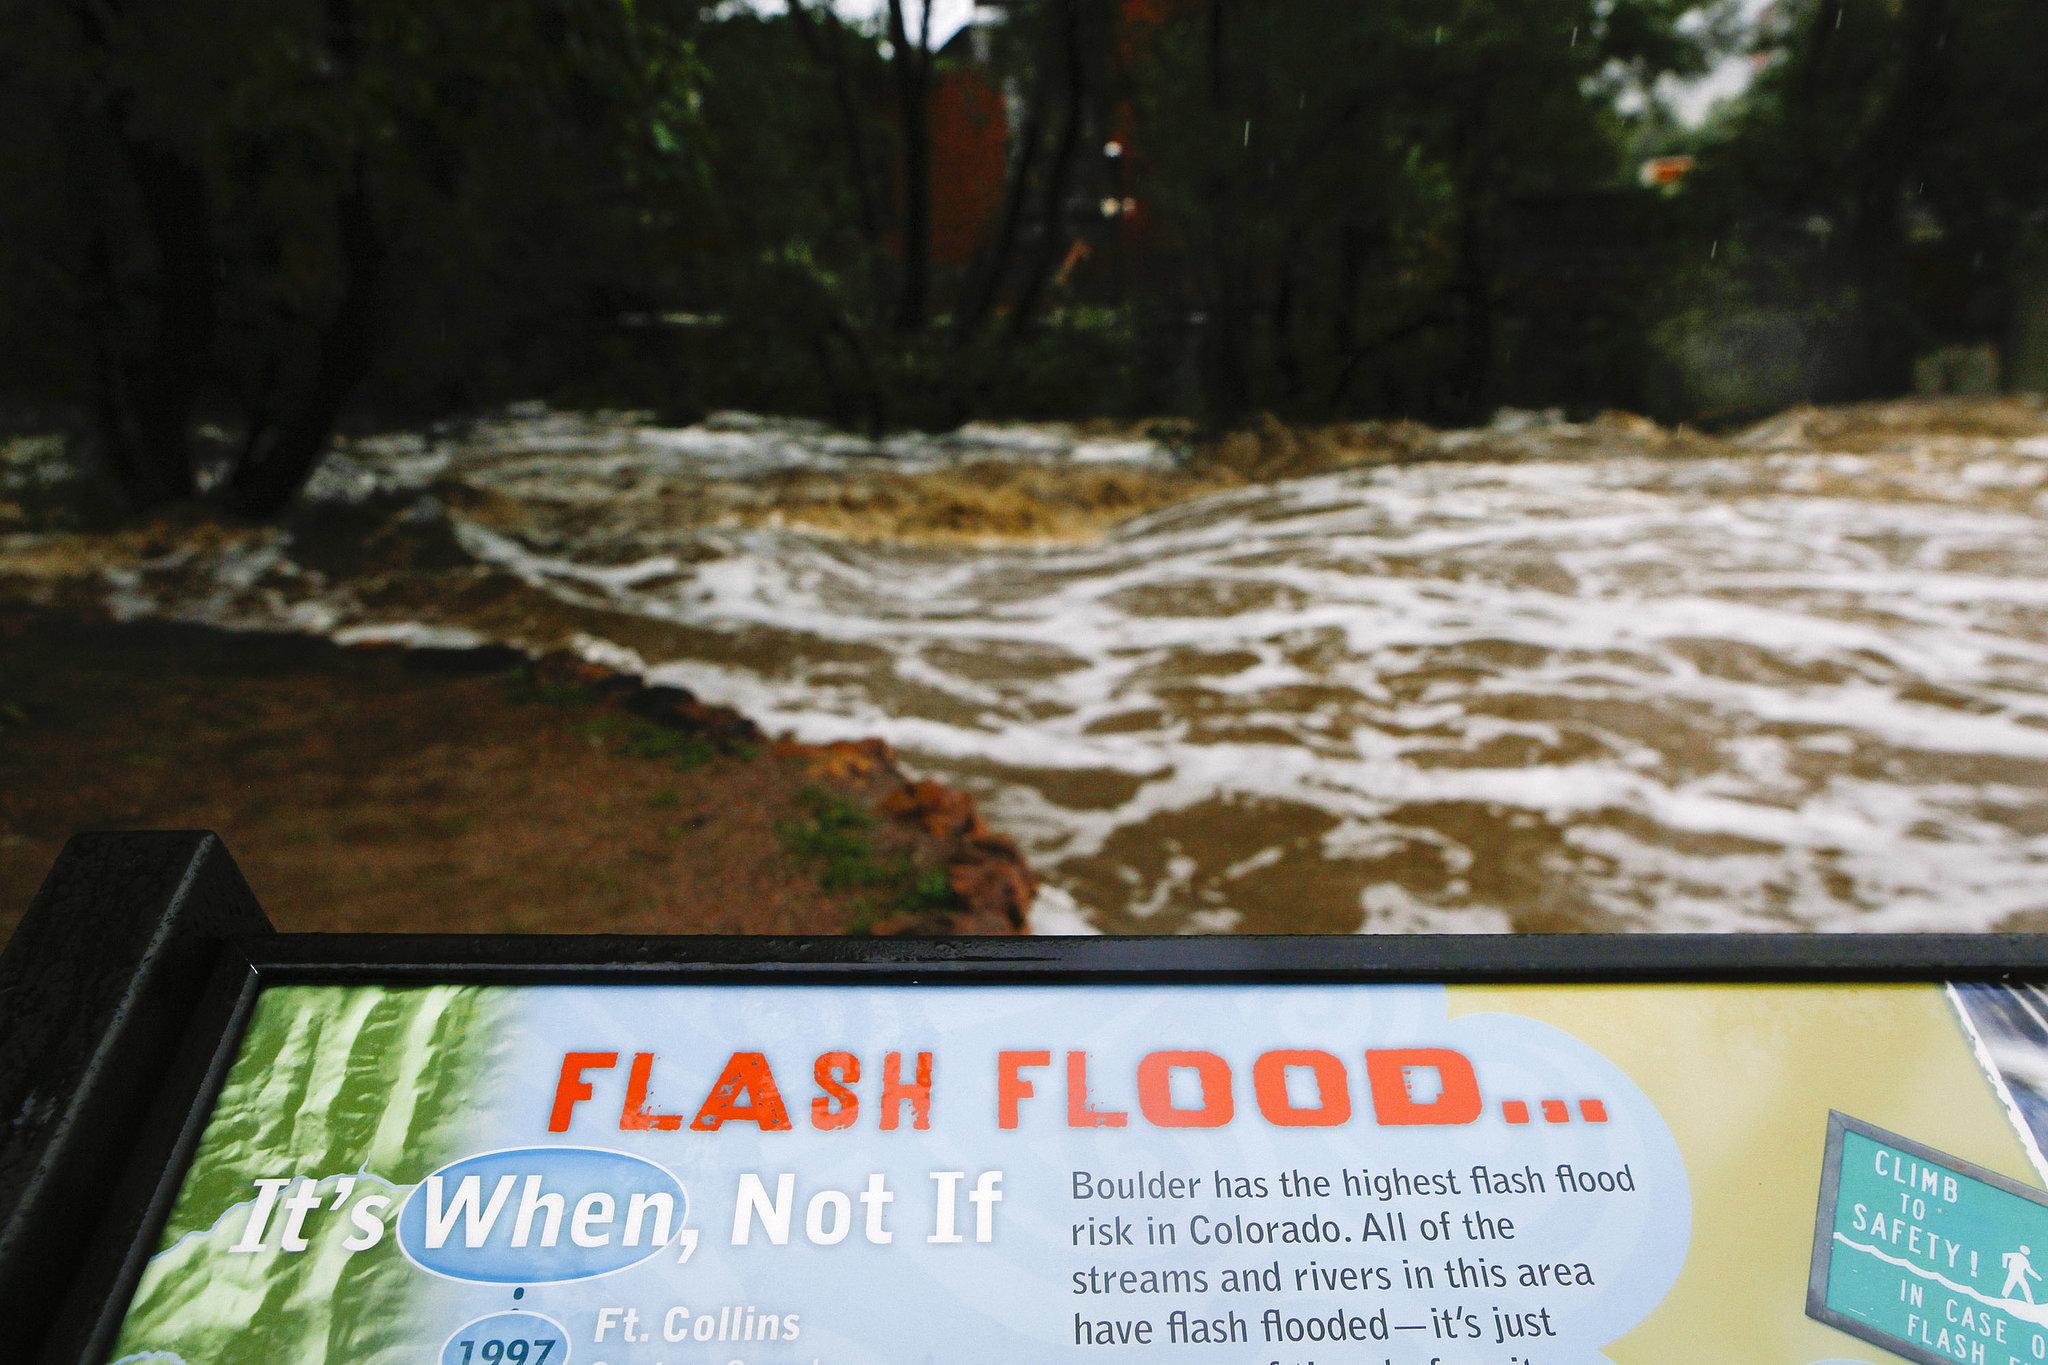 A flash flood sign stood near Boulder Creek, which overflowed following heavy rains.